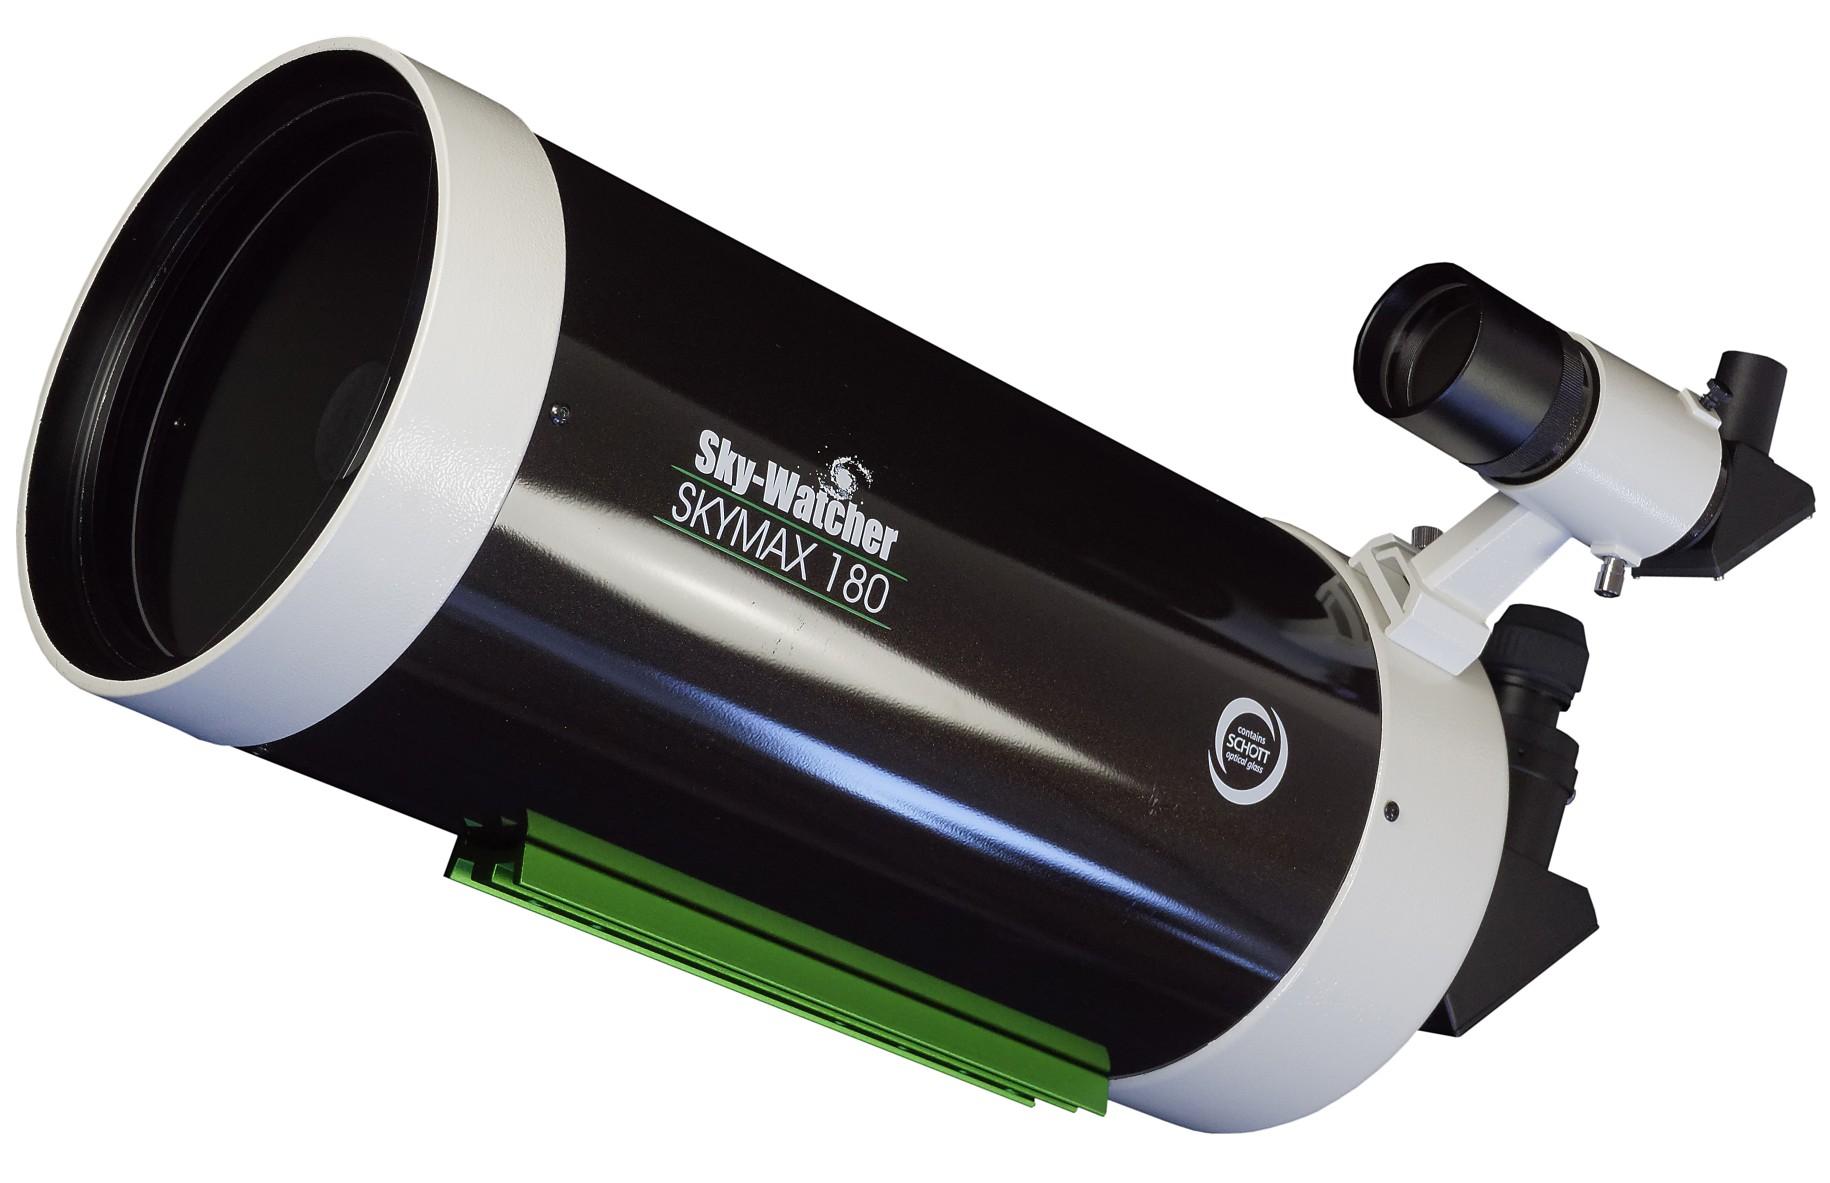 Lacerta SWM180 -SkyWatcher